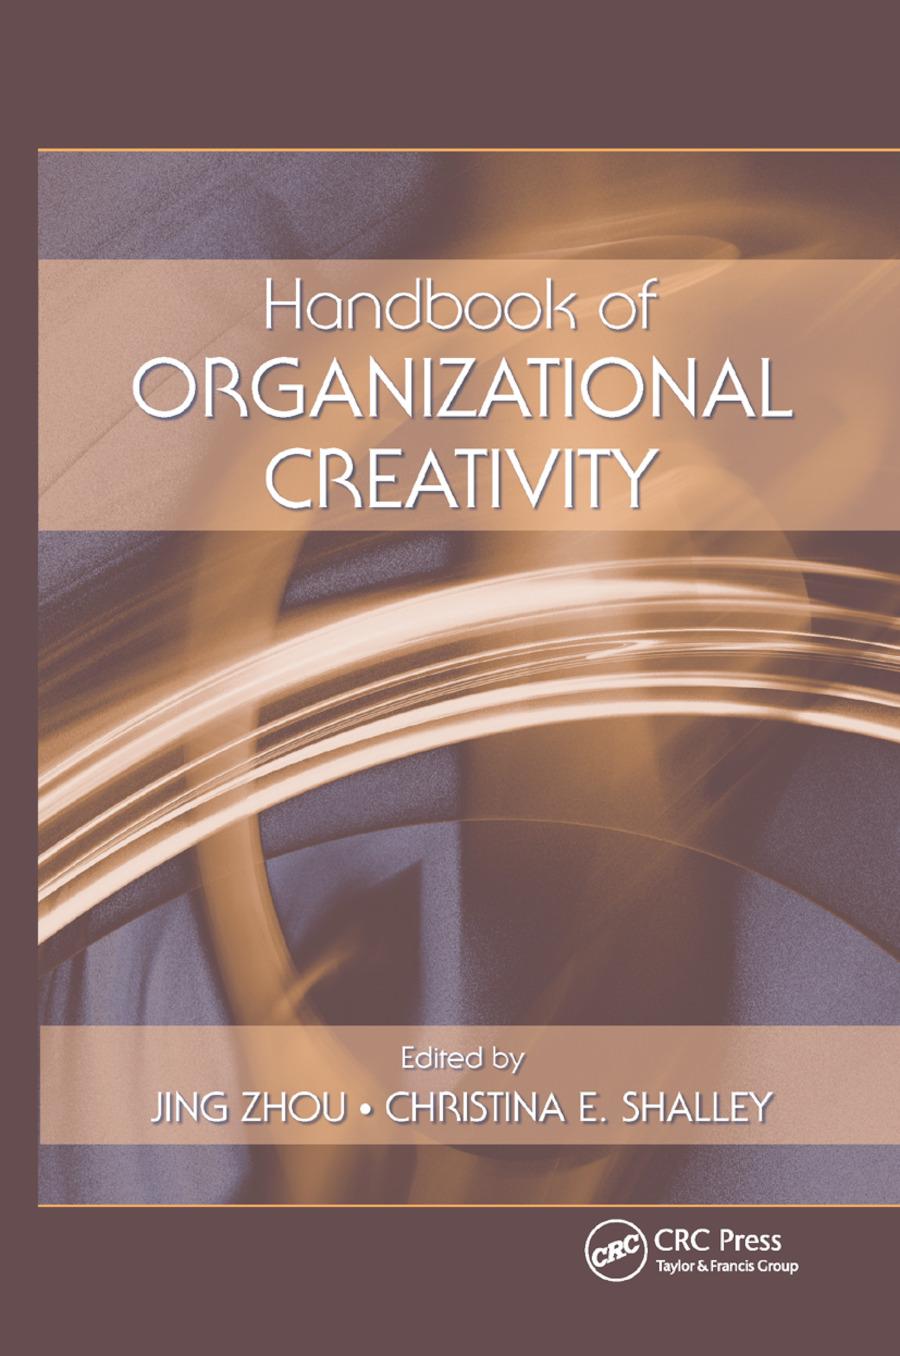 Handbook of Organizational Creativity: 1st Edition (Paperback) book cover